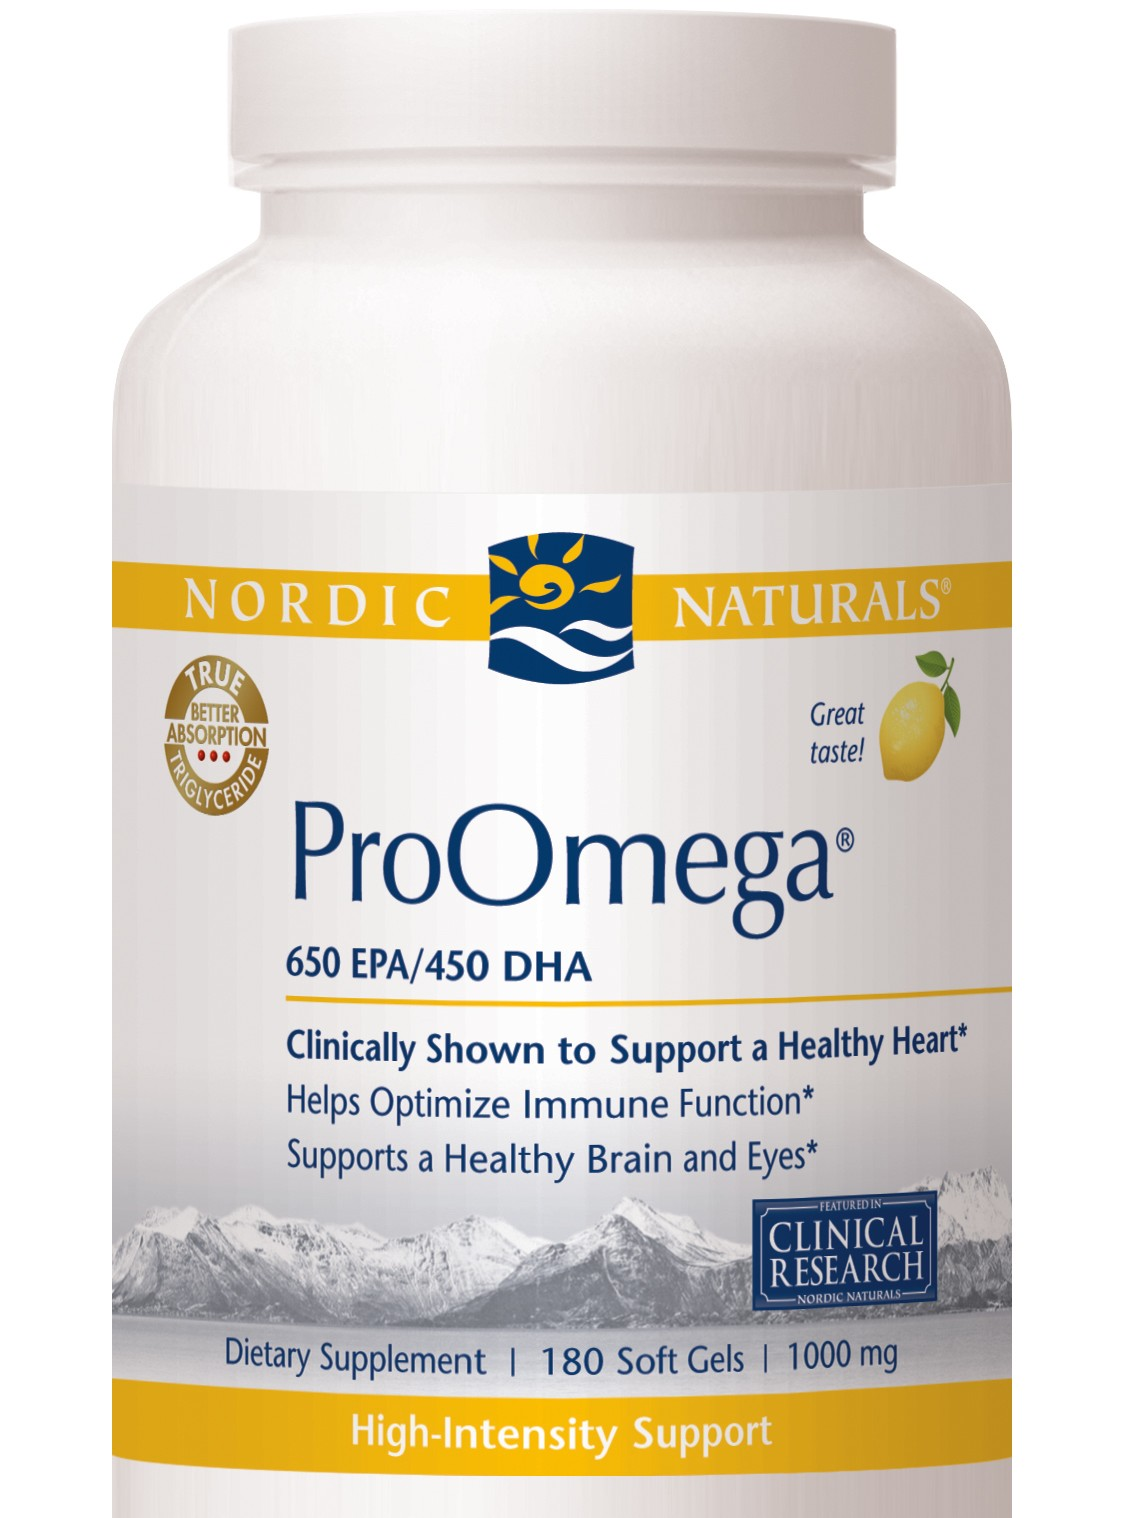 Nordic naturals fish oil proomega omega 3 39 s the for Fish oil nordic naturals